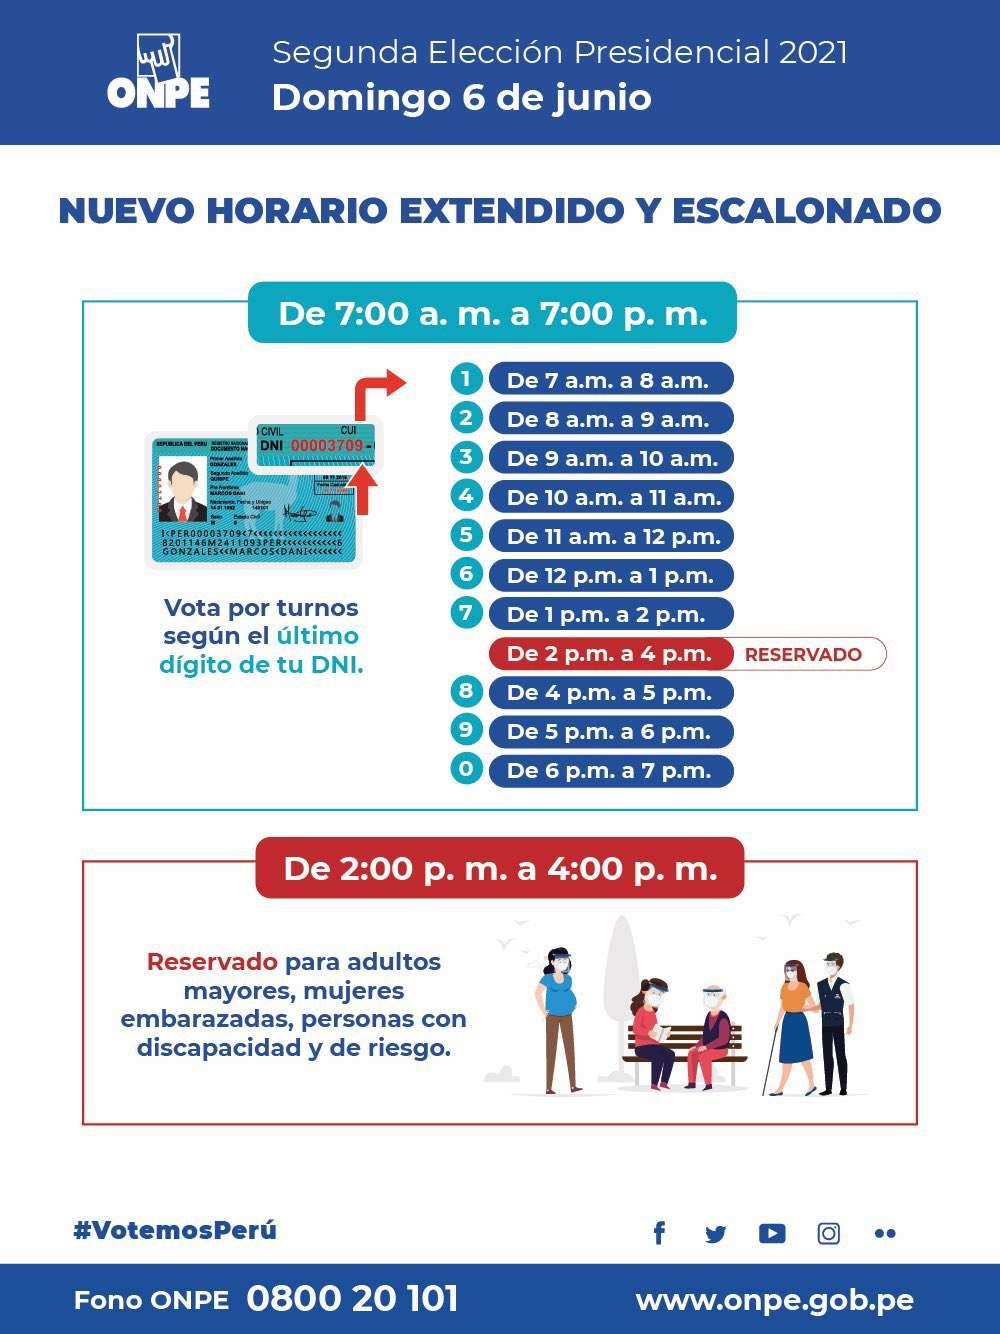 Horario de voto escalonado segunda vuelta presidencial Perú 2021.